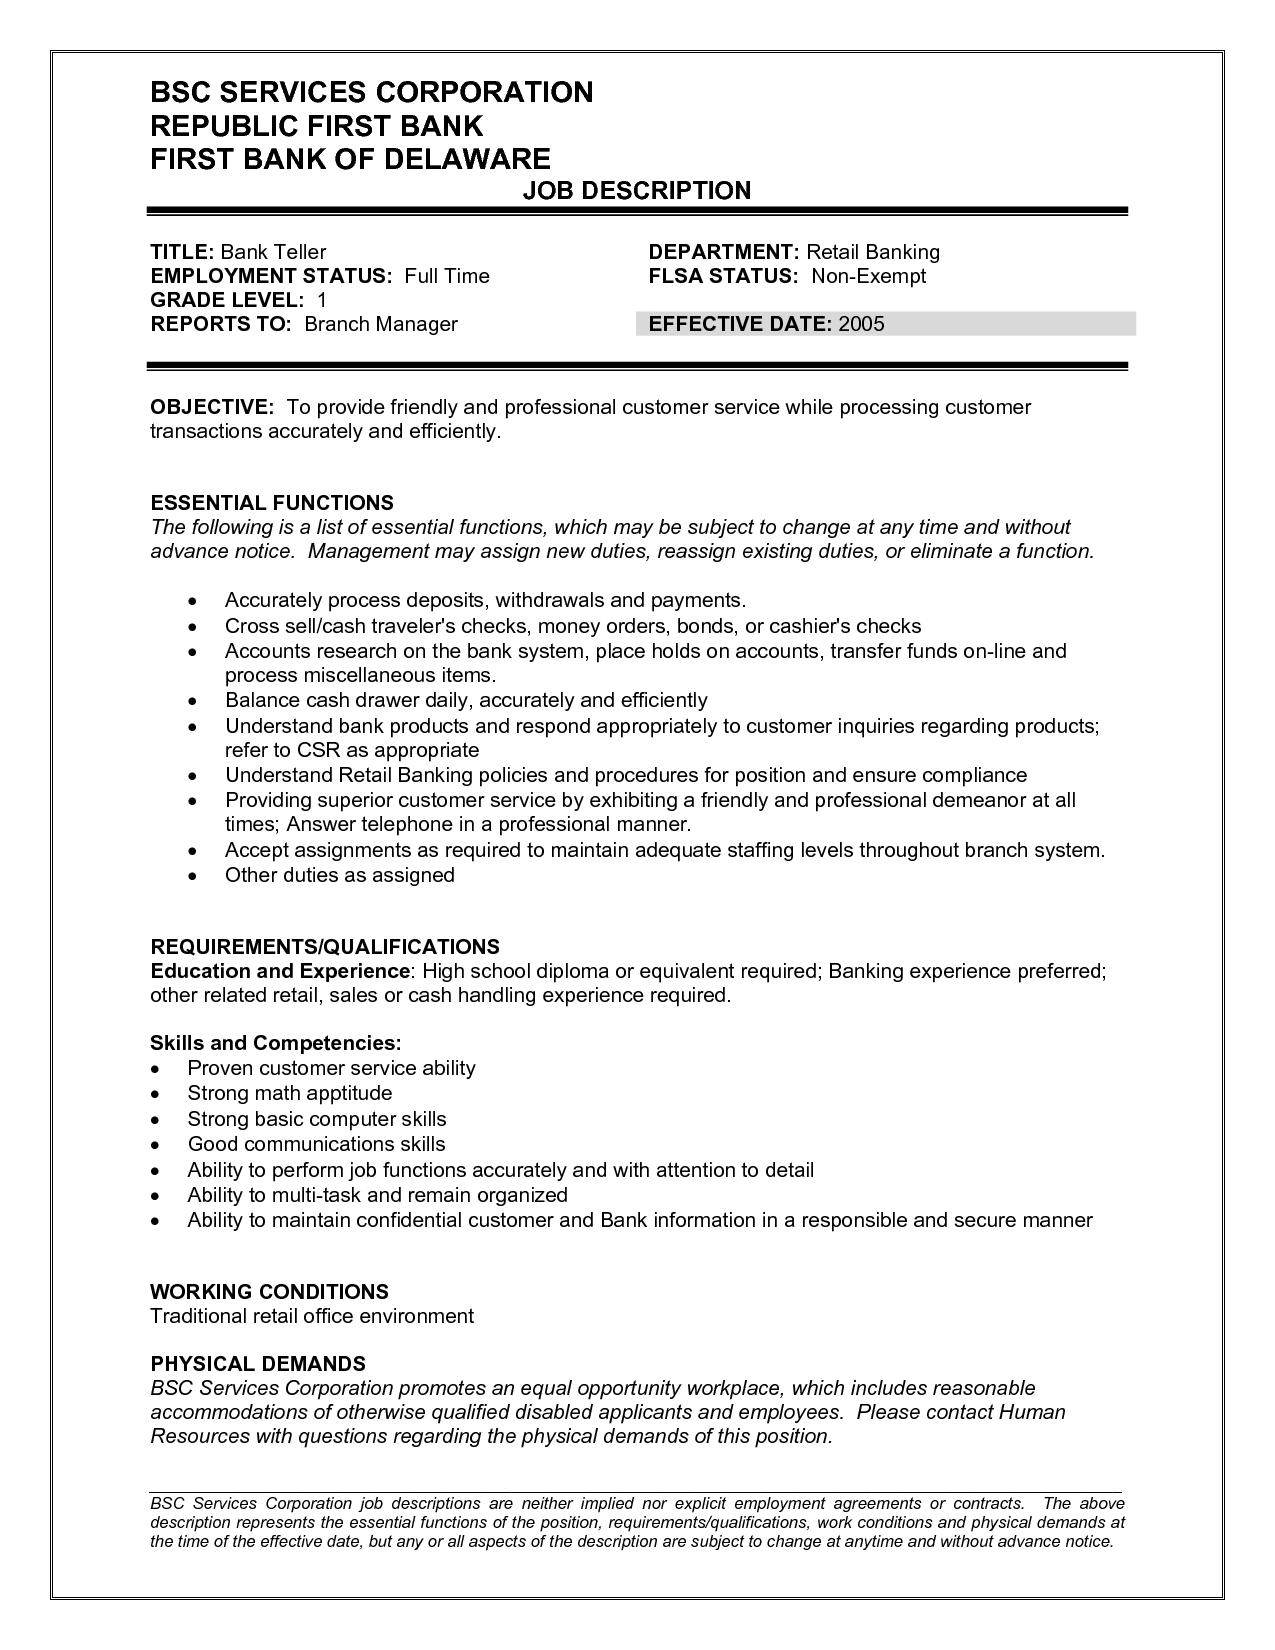 Bank Teller Job Description For Resume Resumesdesign Bank Teller Resume Resume No Experience Resume Examples